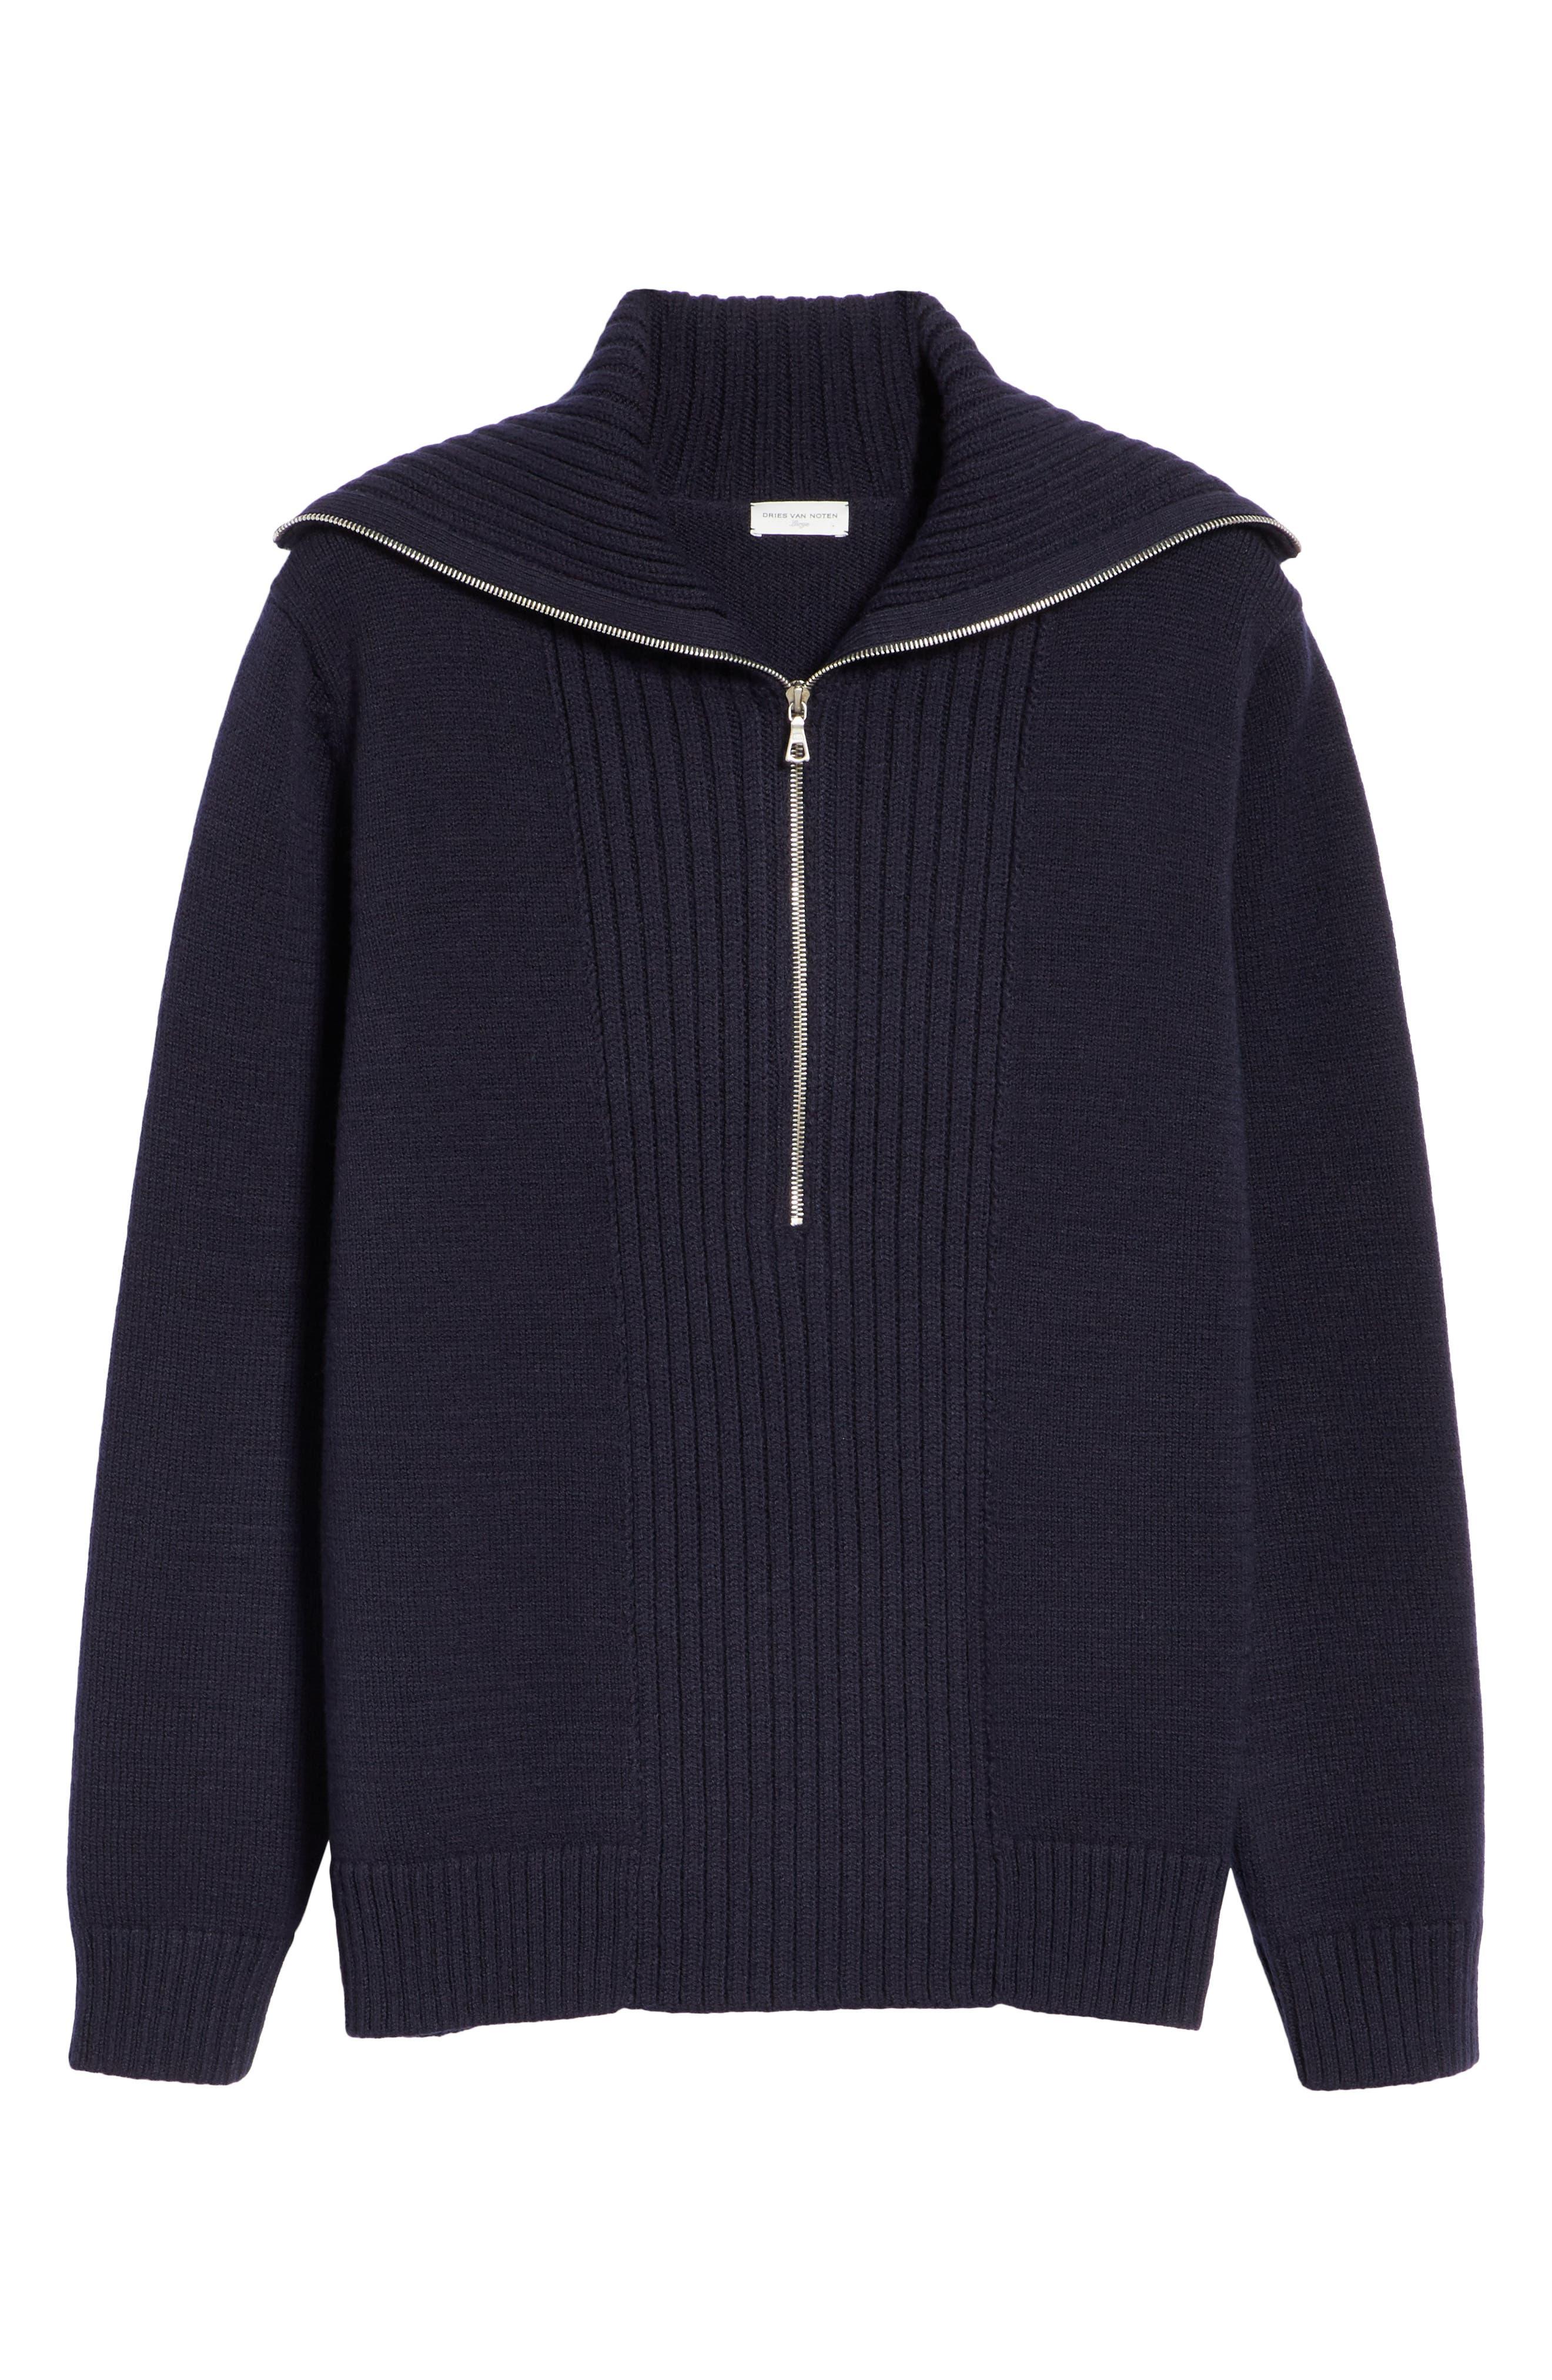 Mikhos Half Zip Sweater,                             Alternate thumbnail 6, color,                             NAVY